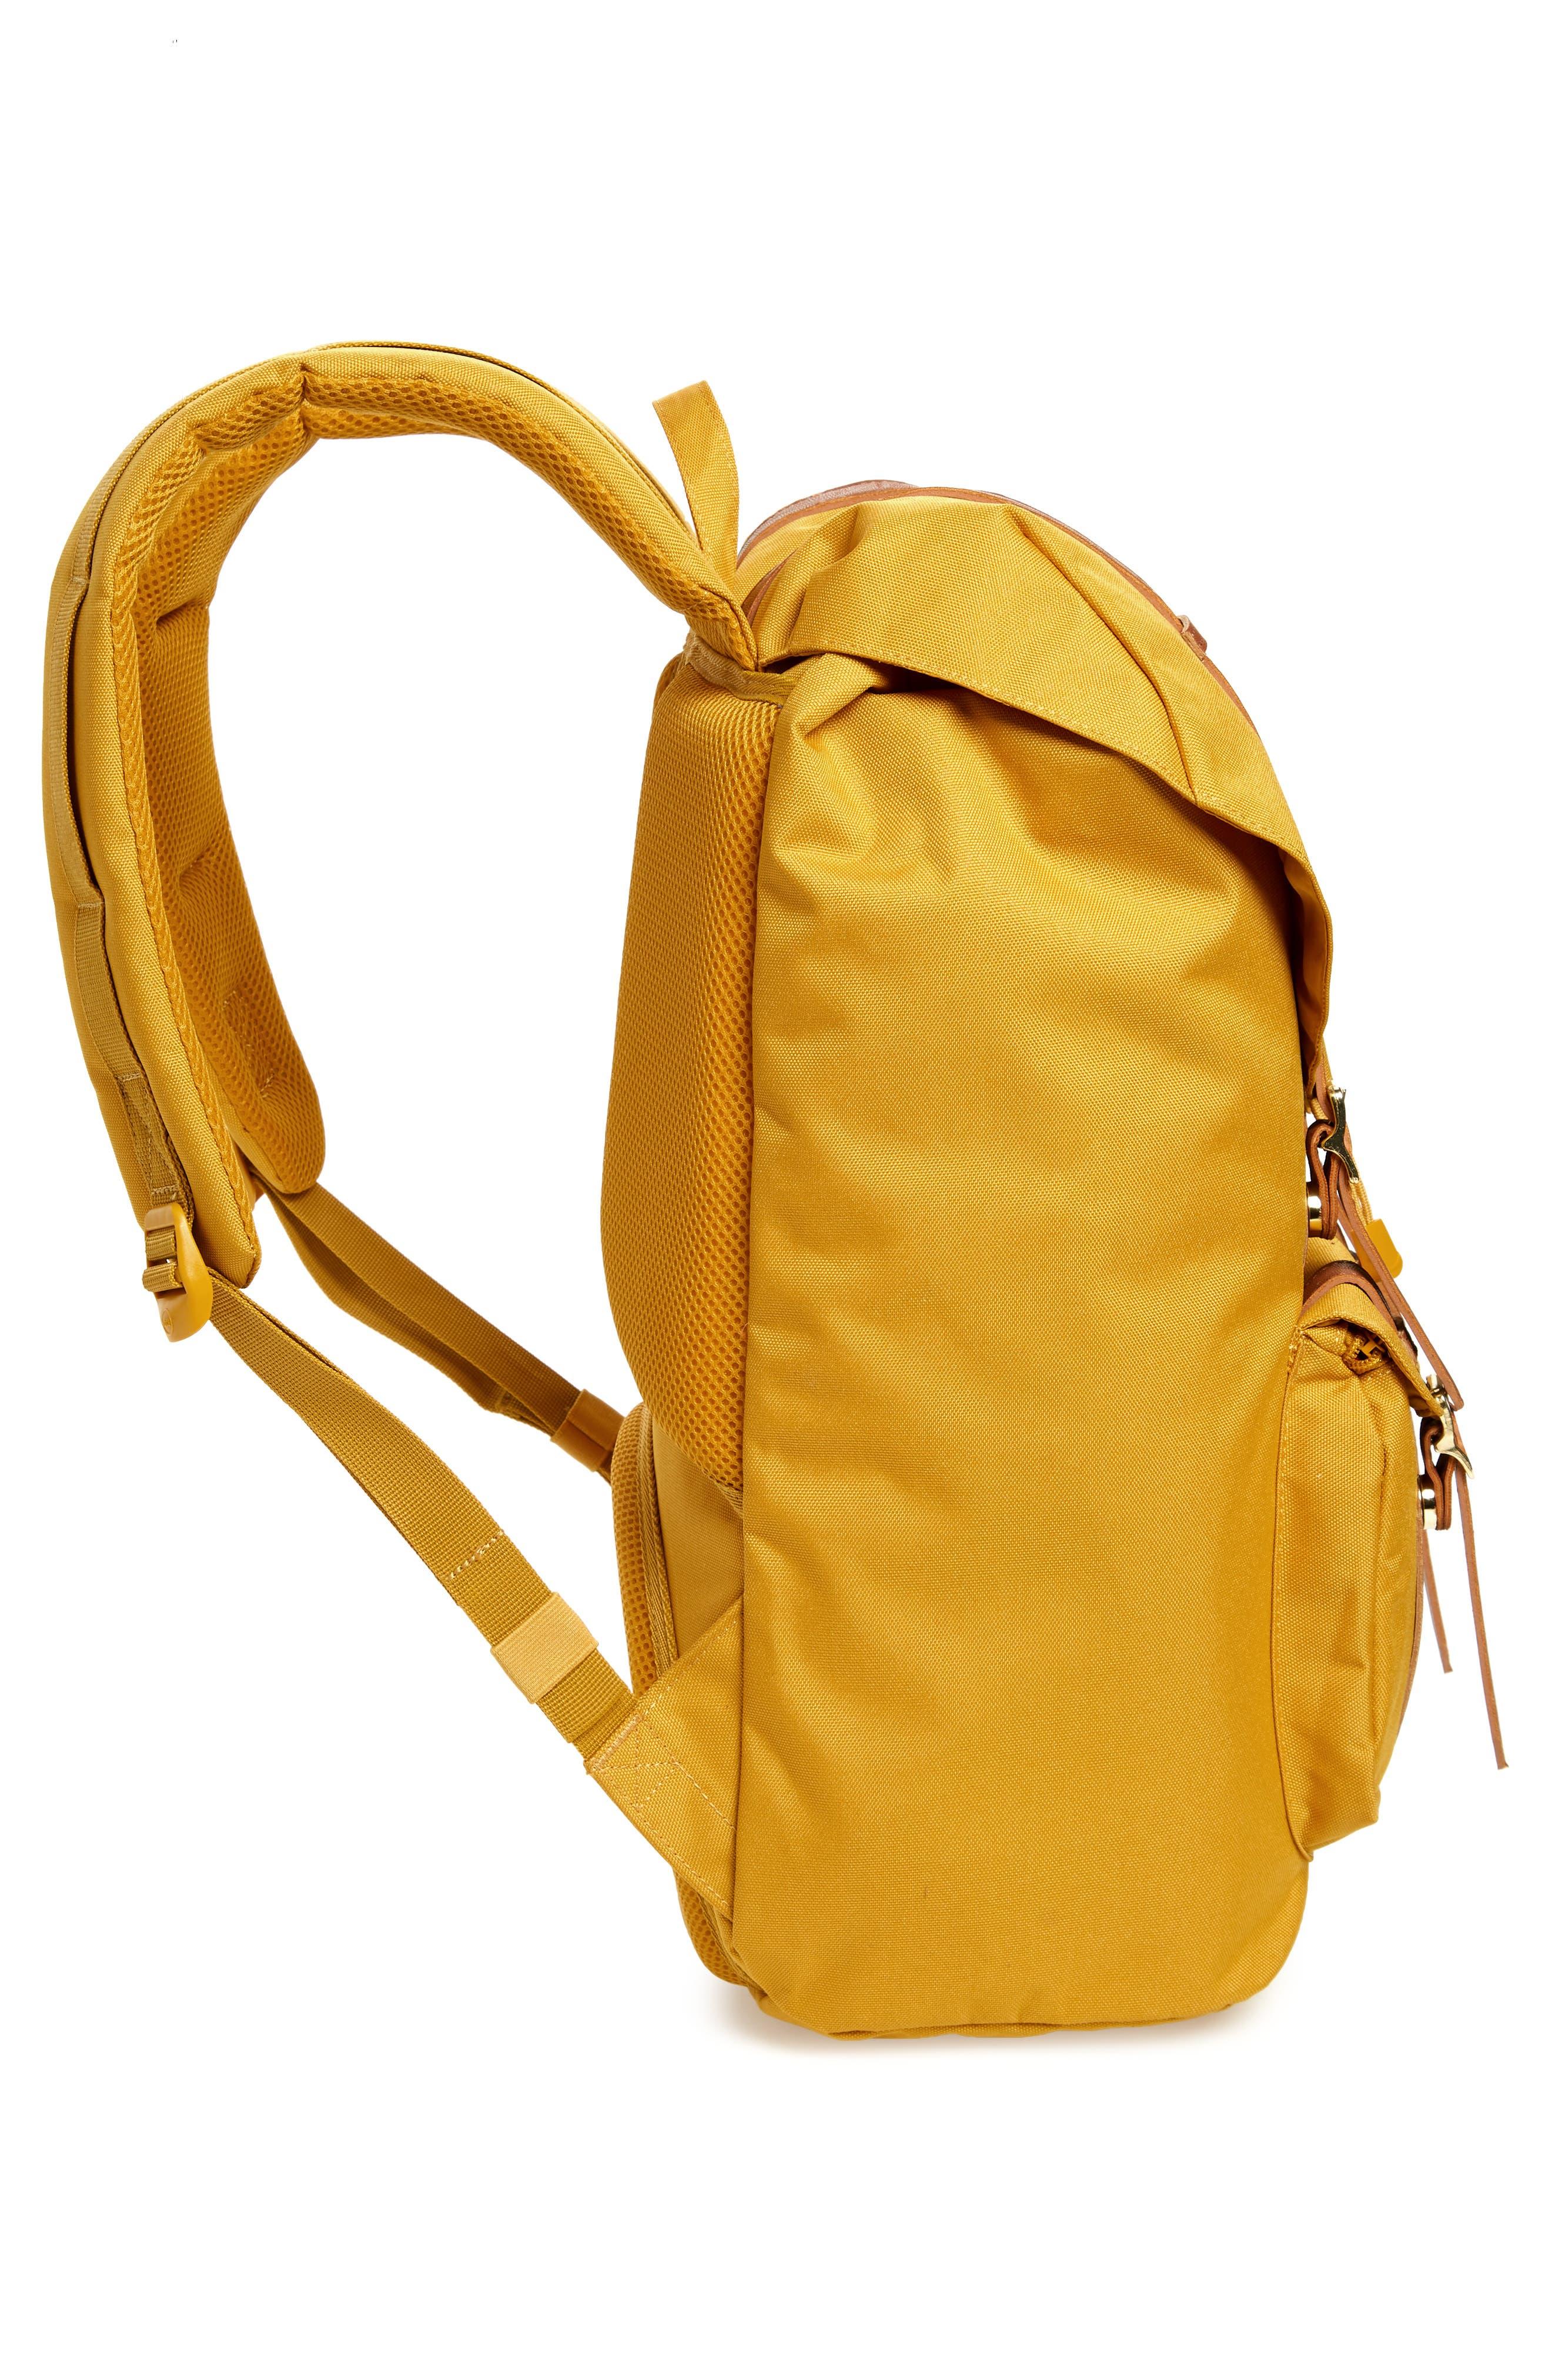 Little America Backpack,                             Alternate thumbnail 5, color,                             ARROW WOOD/ TAN LEATHER